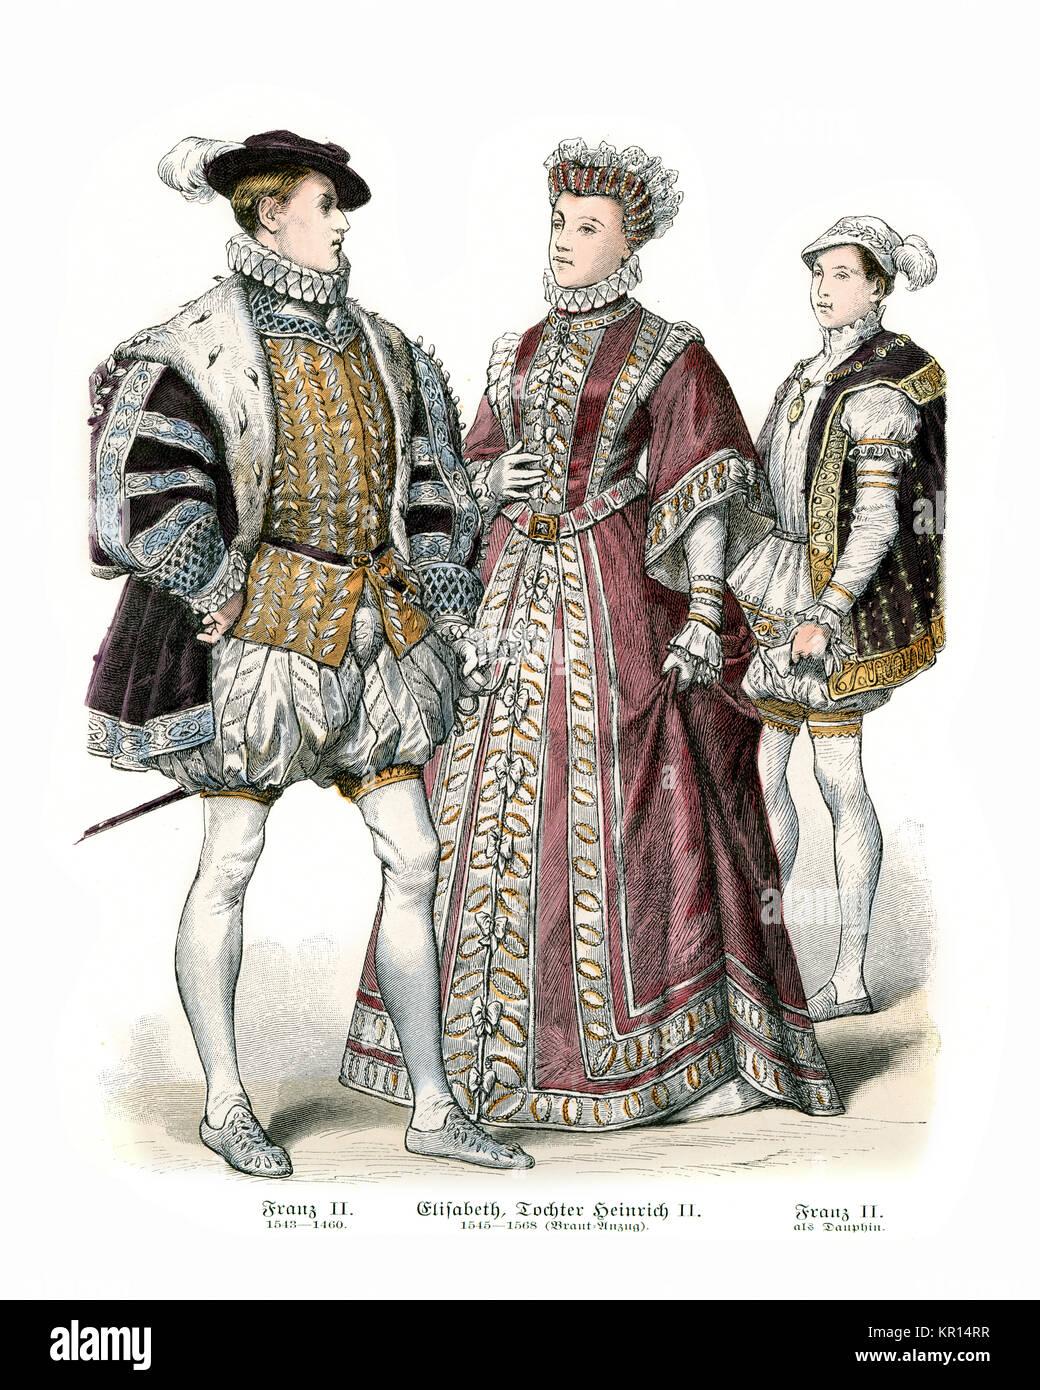 https www alamyimages fr photo image costumes de france 16eme siecle francois ii elizabeth fille de henri ii francois ii et costume de dauphin 169056155 html